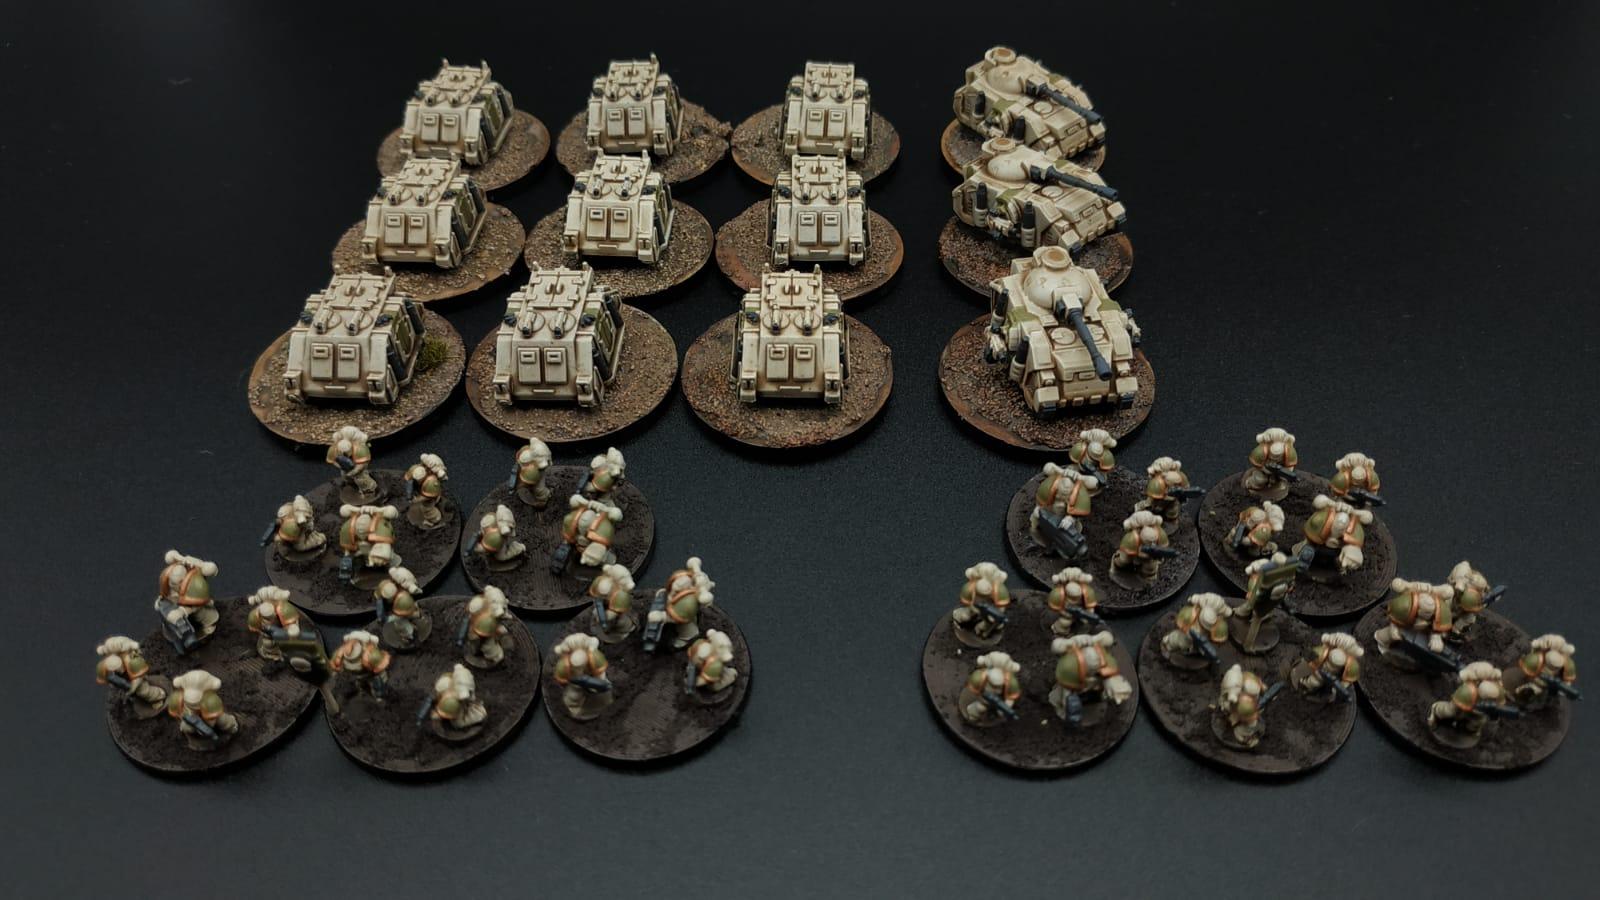 3D printed Epic Nurgle Death Guard Space Marines